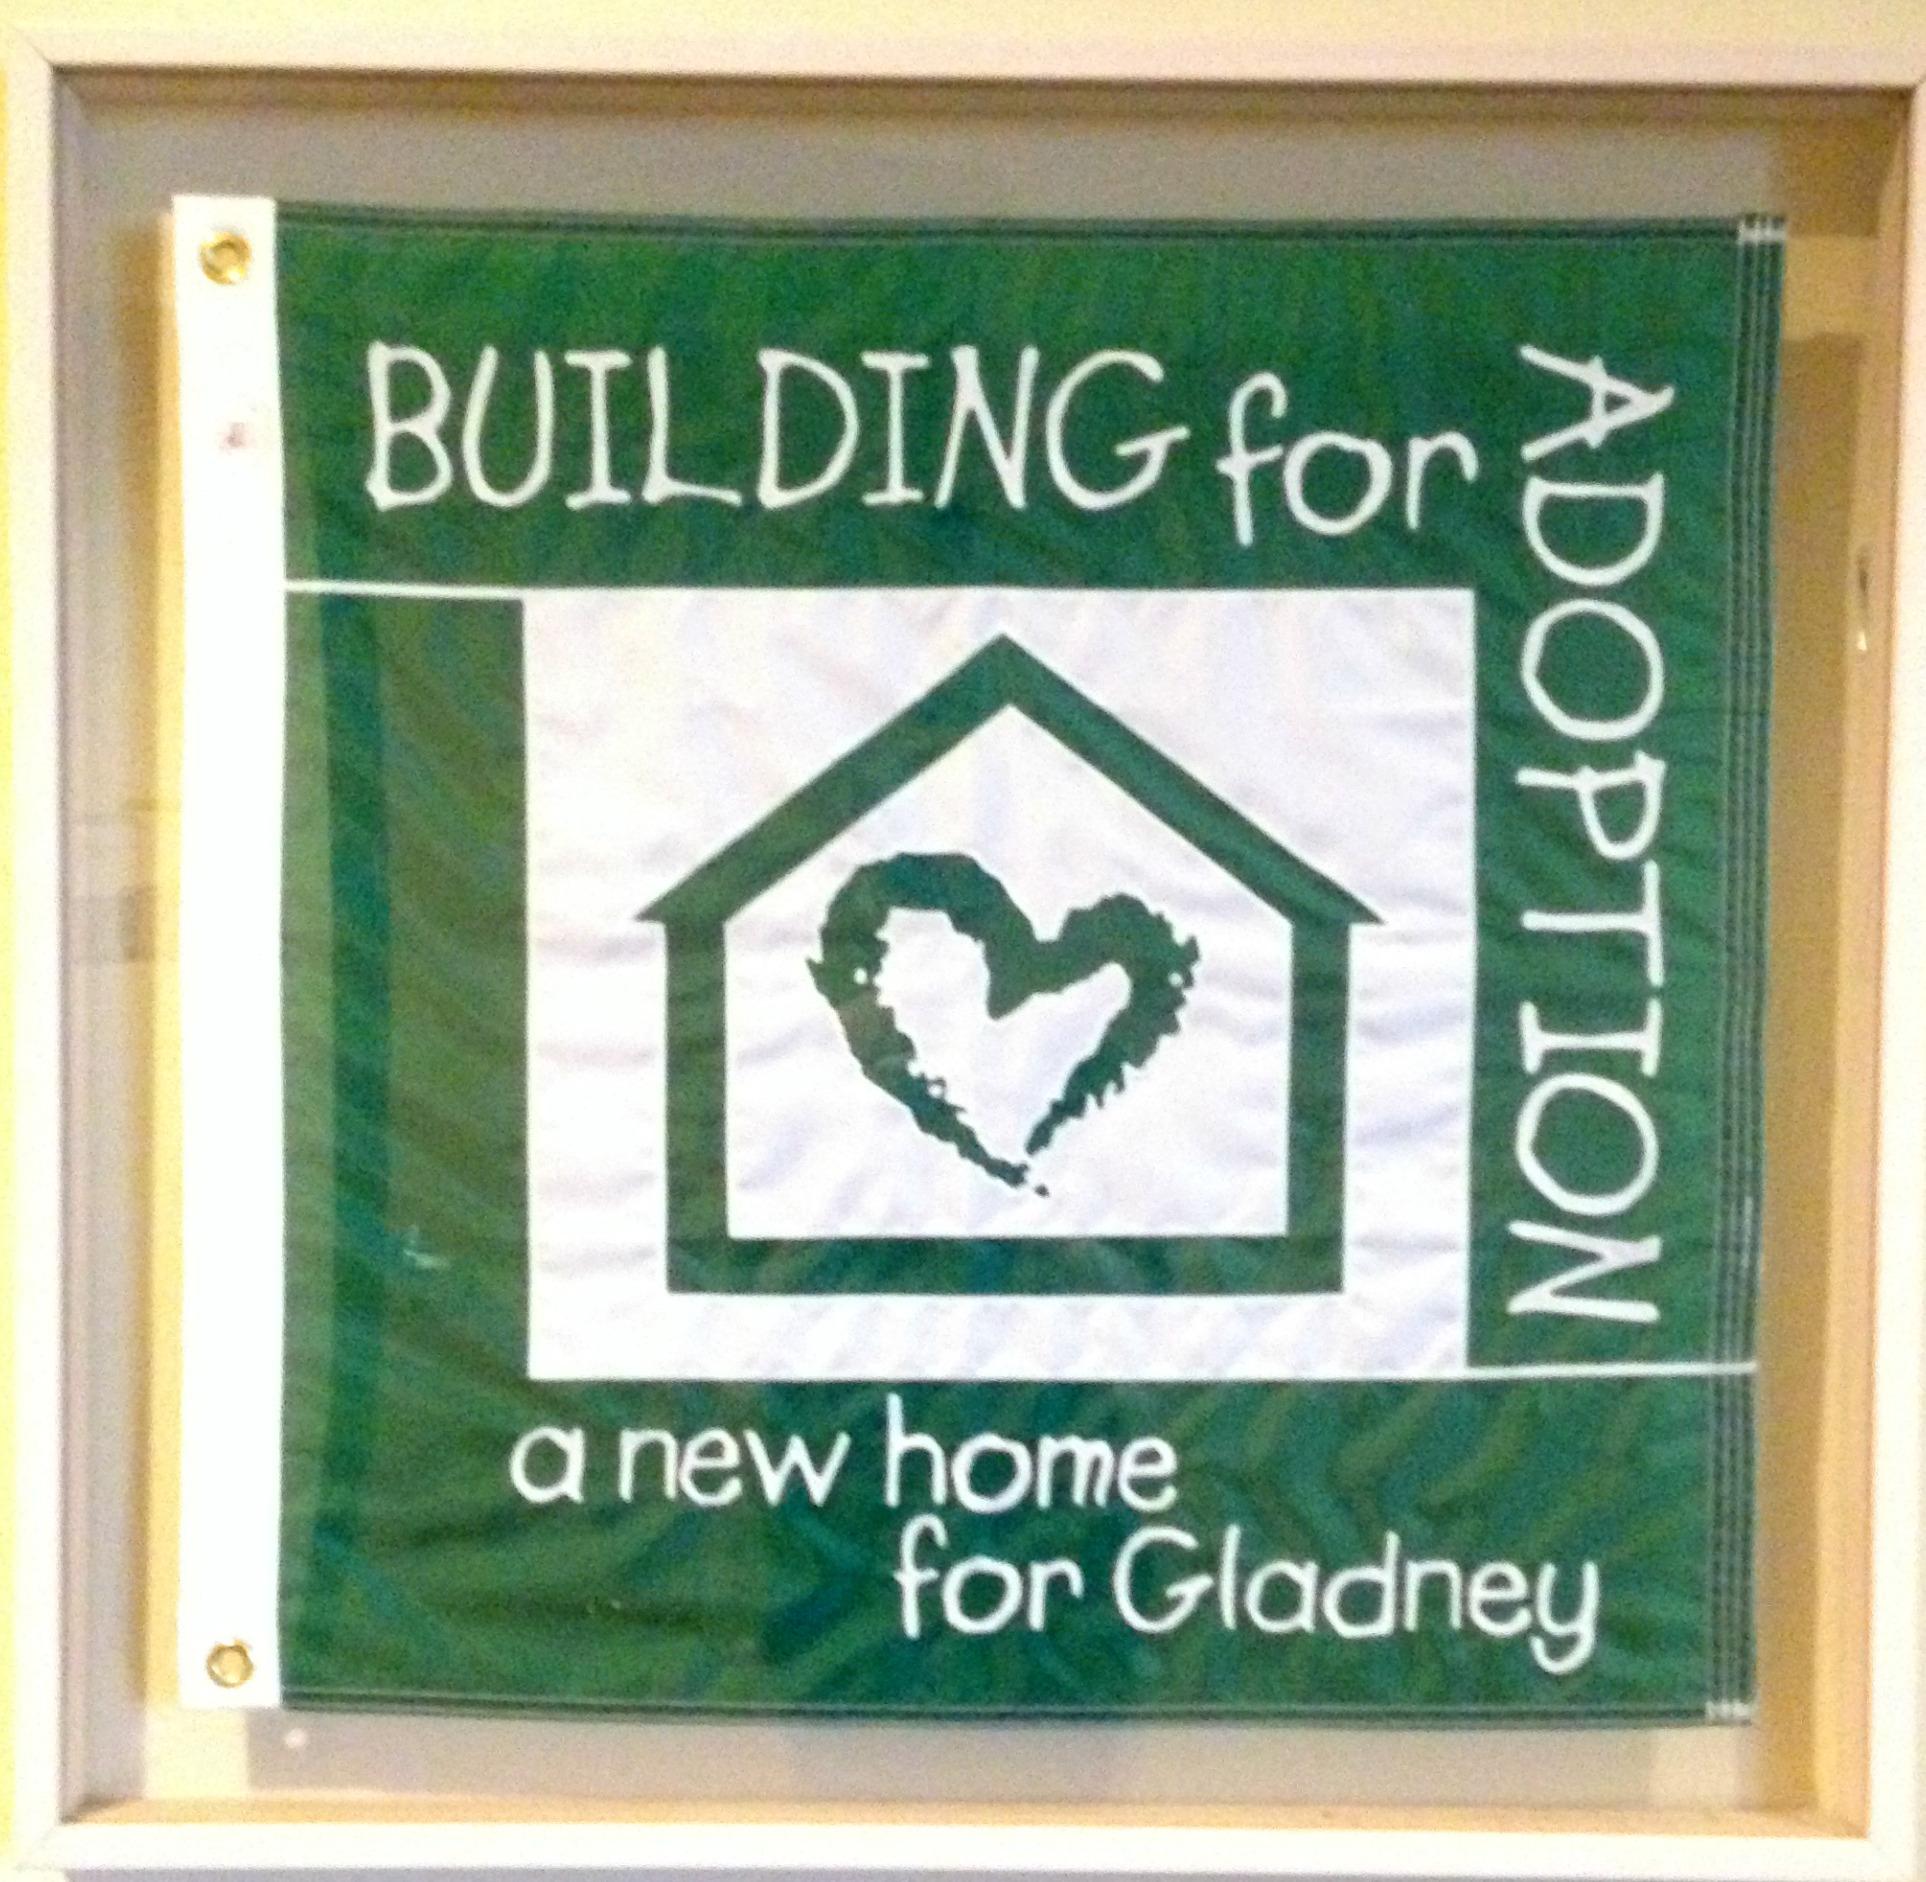 Gladney Adoption Facts